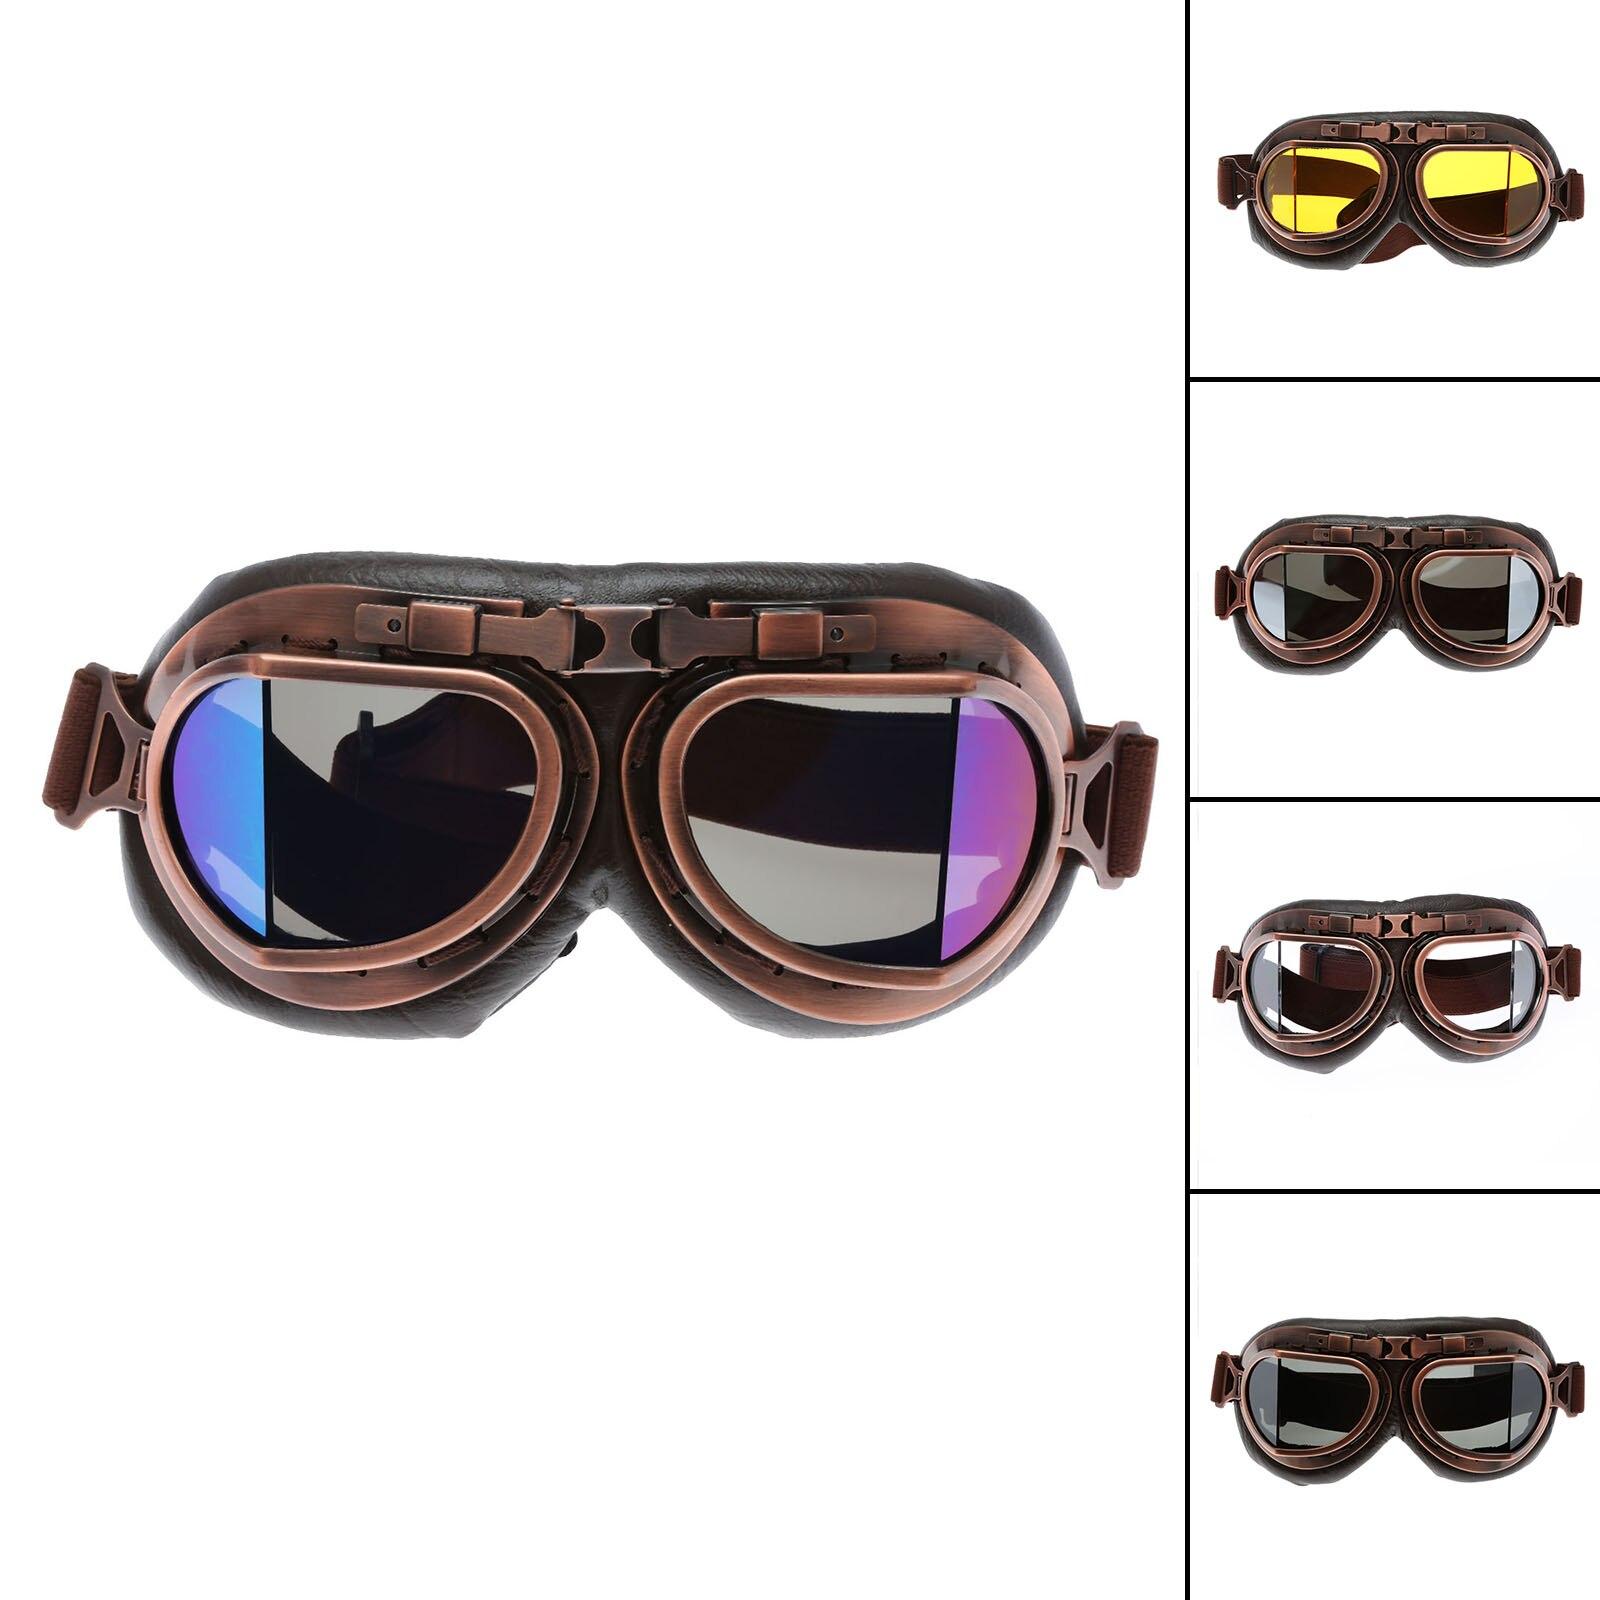 Motorcycle Goggles Glasses Vintage Motocross Classic Goggles Retro Aviator Pilot Cruiser Steampunk ATV Bike UV Protection Copper